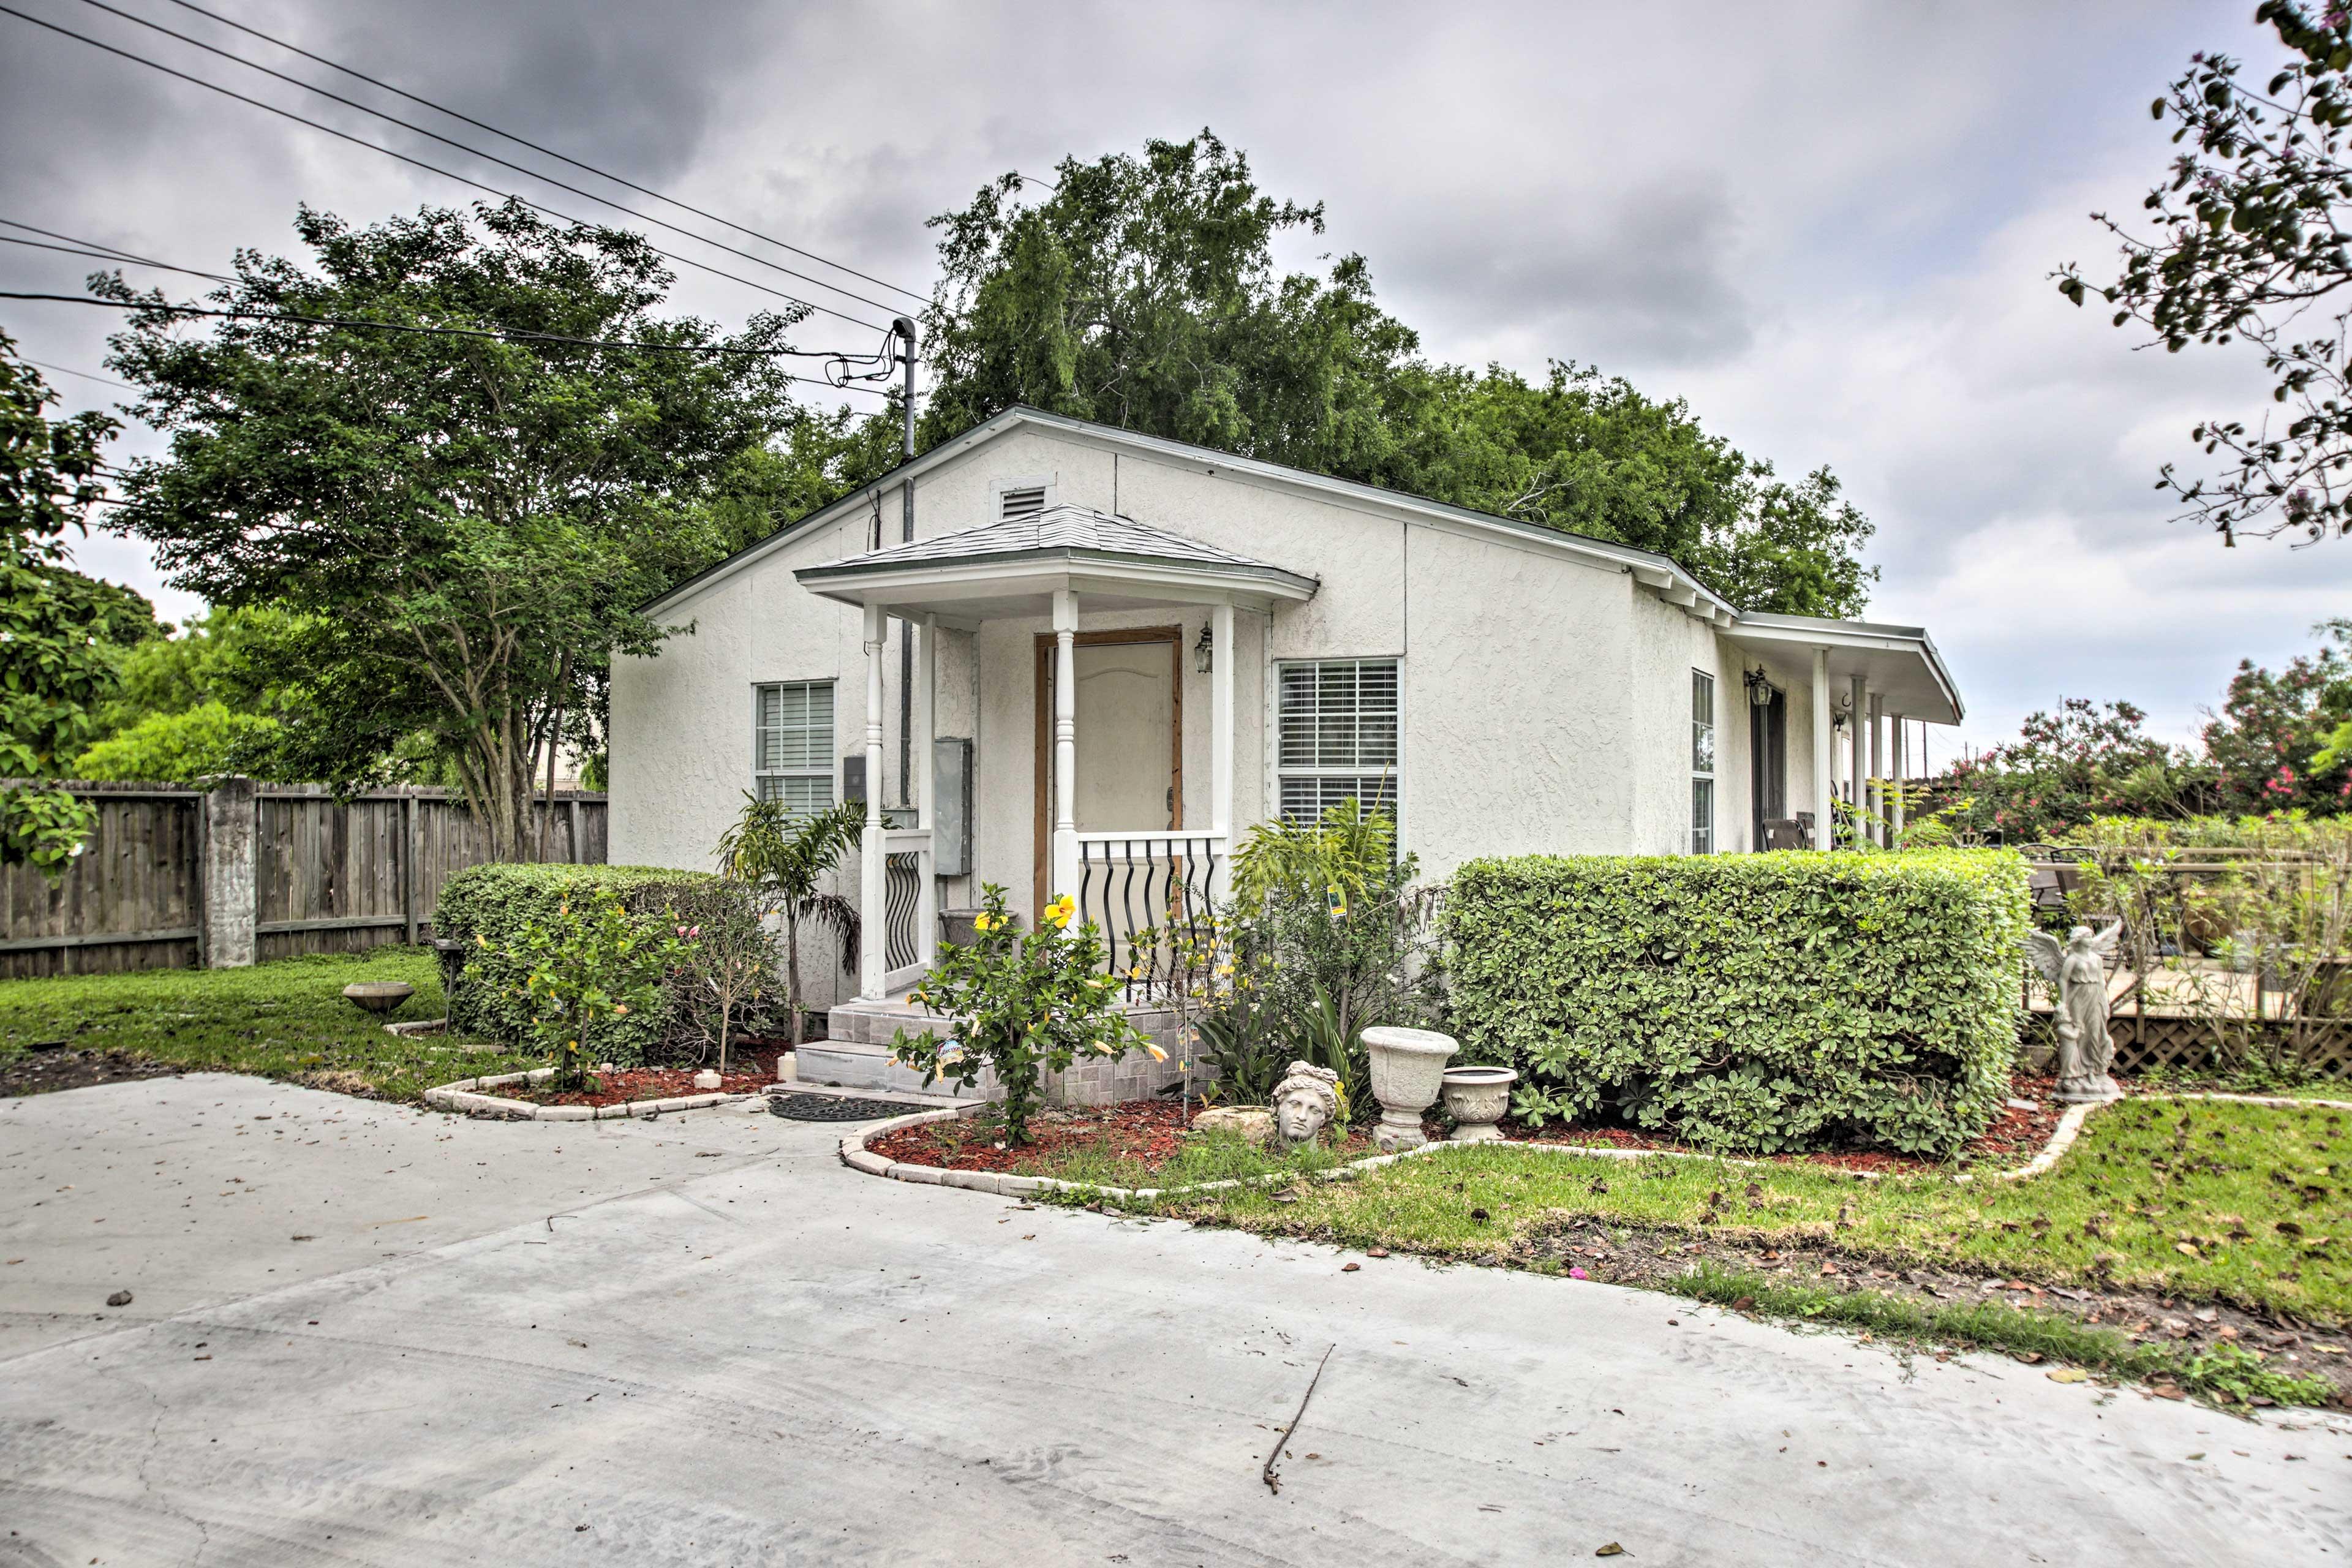 Corpus Christi Vacation Rental | 1-Story Cottage | 2BR | 1.5BA | 1,000 Sq Ft